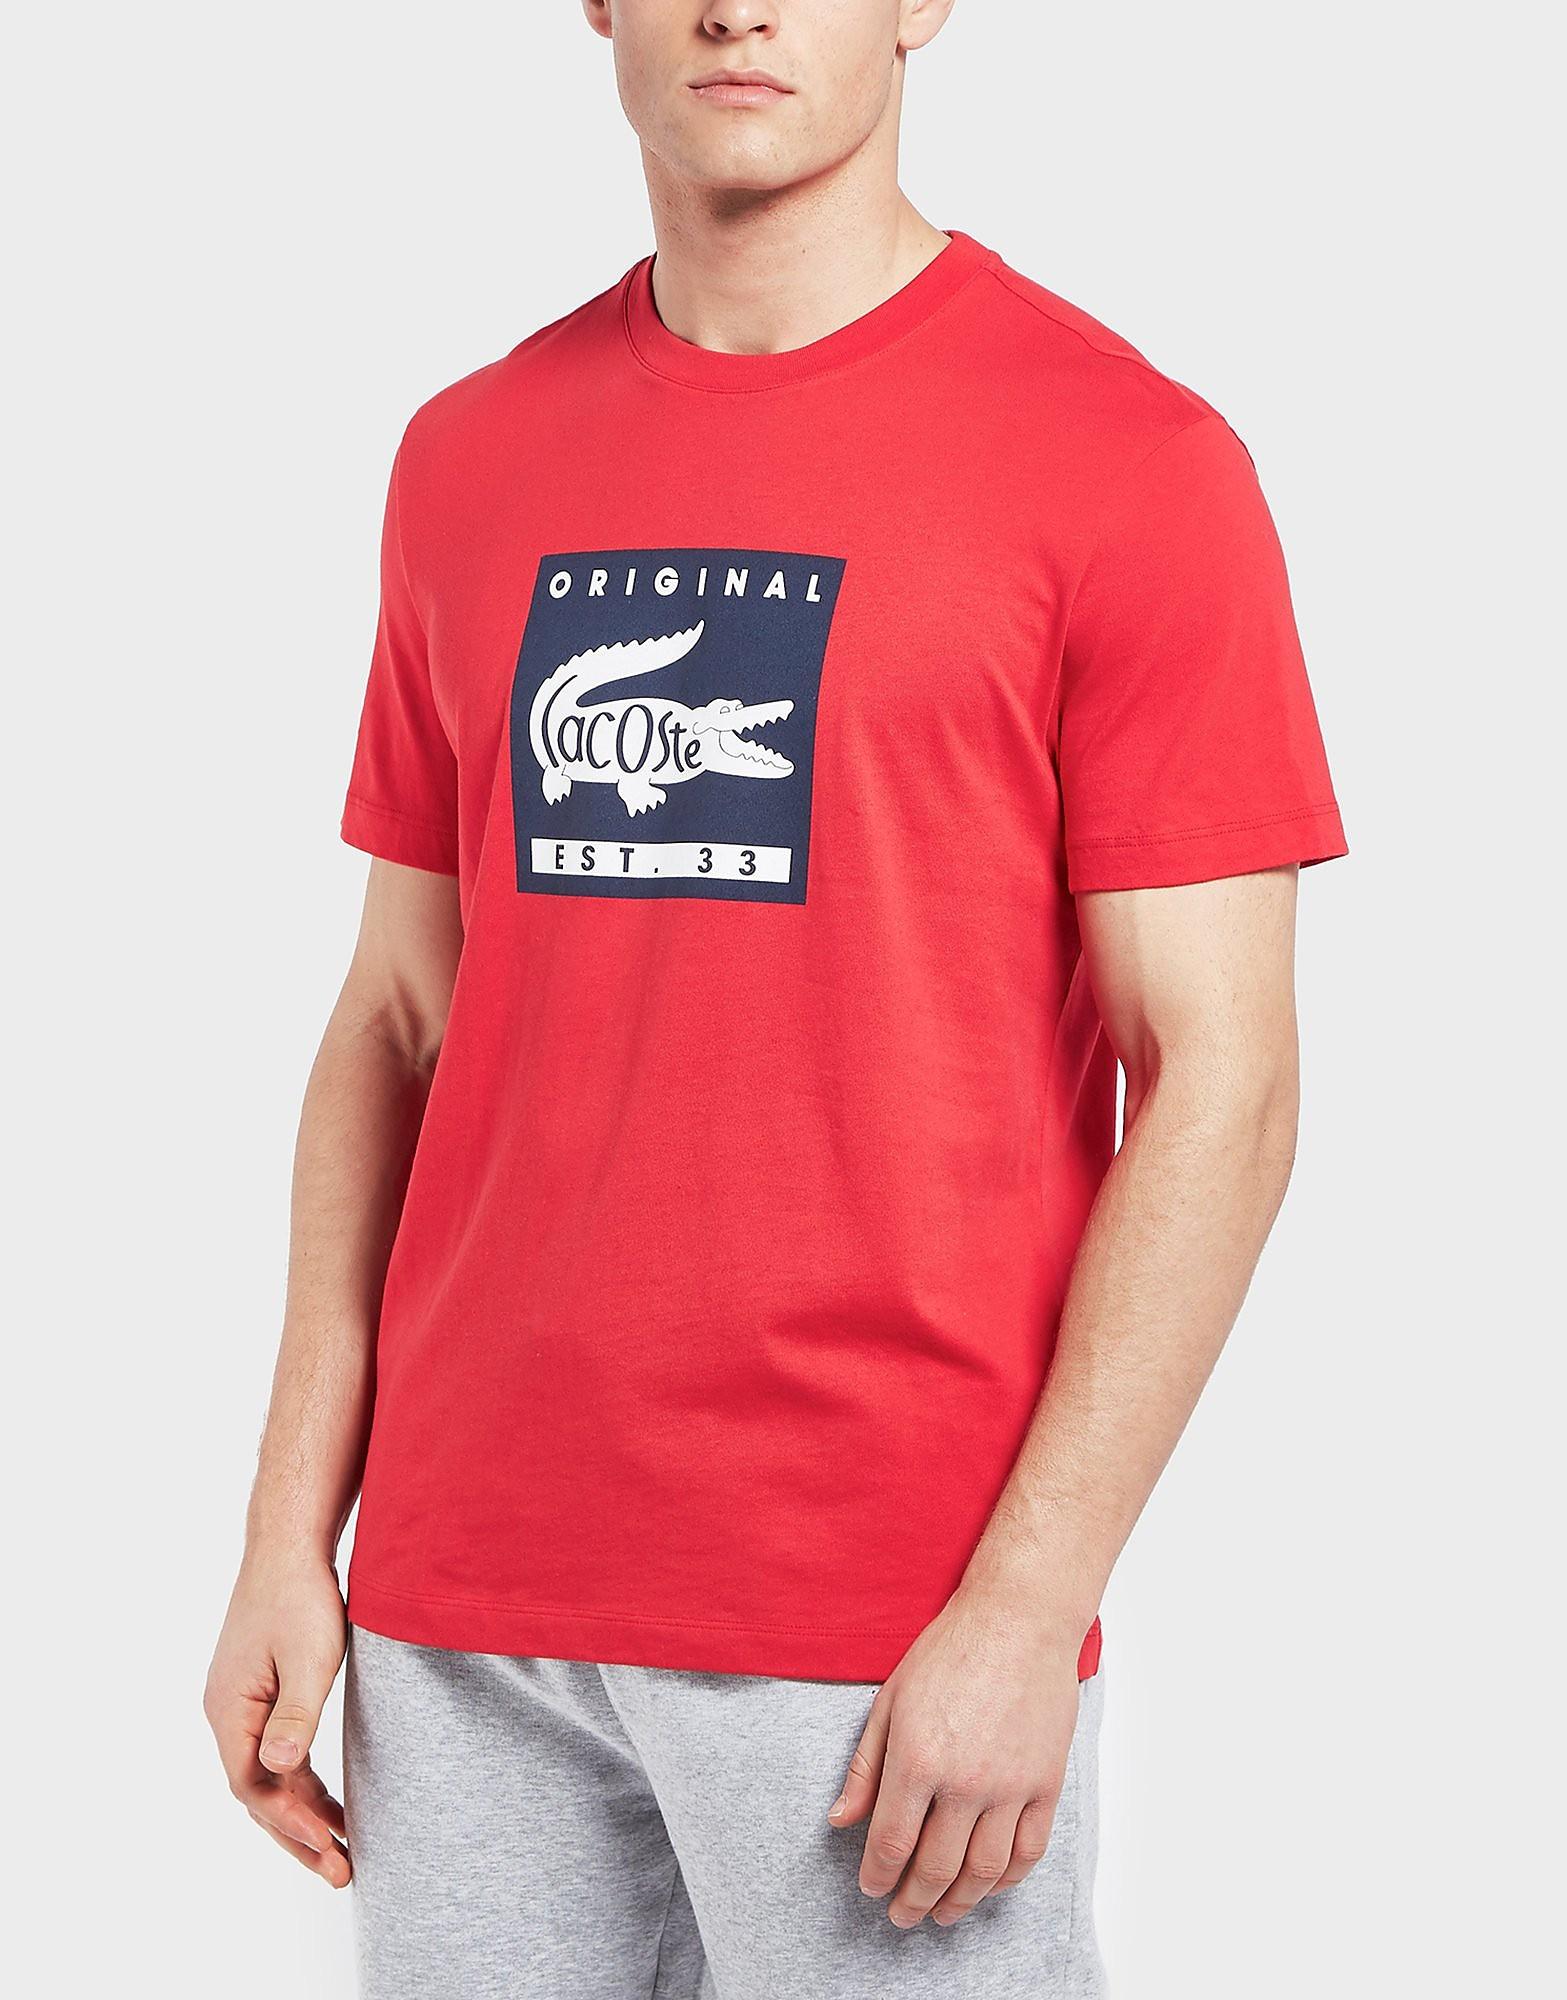 Lacoste Original Logo Short Sleeve T-Shirt